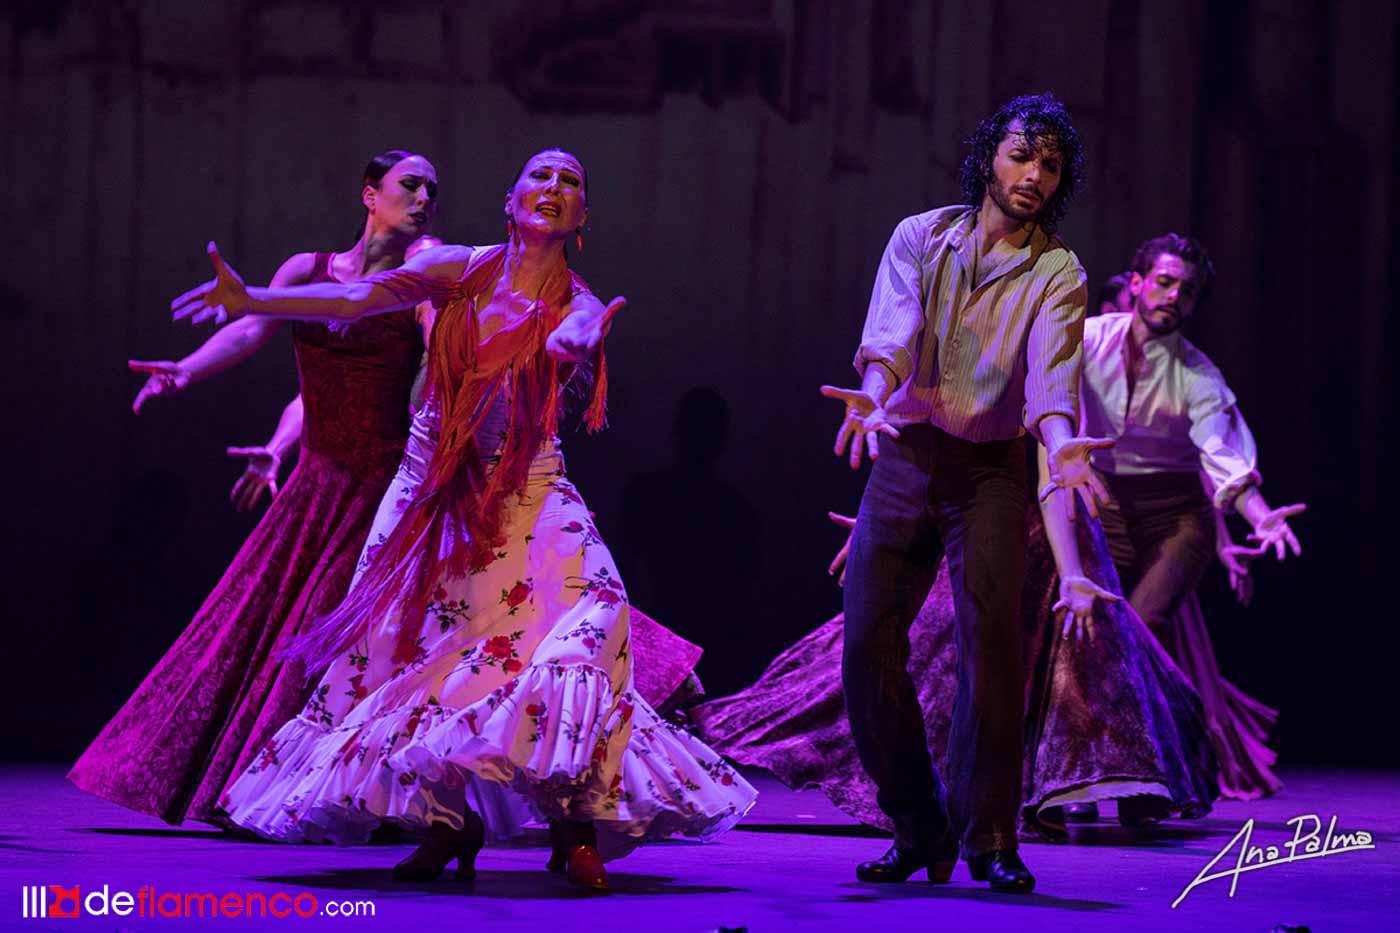 El Ballet Flamenco de la nostalgia o la nostalgia de Ballet